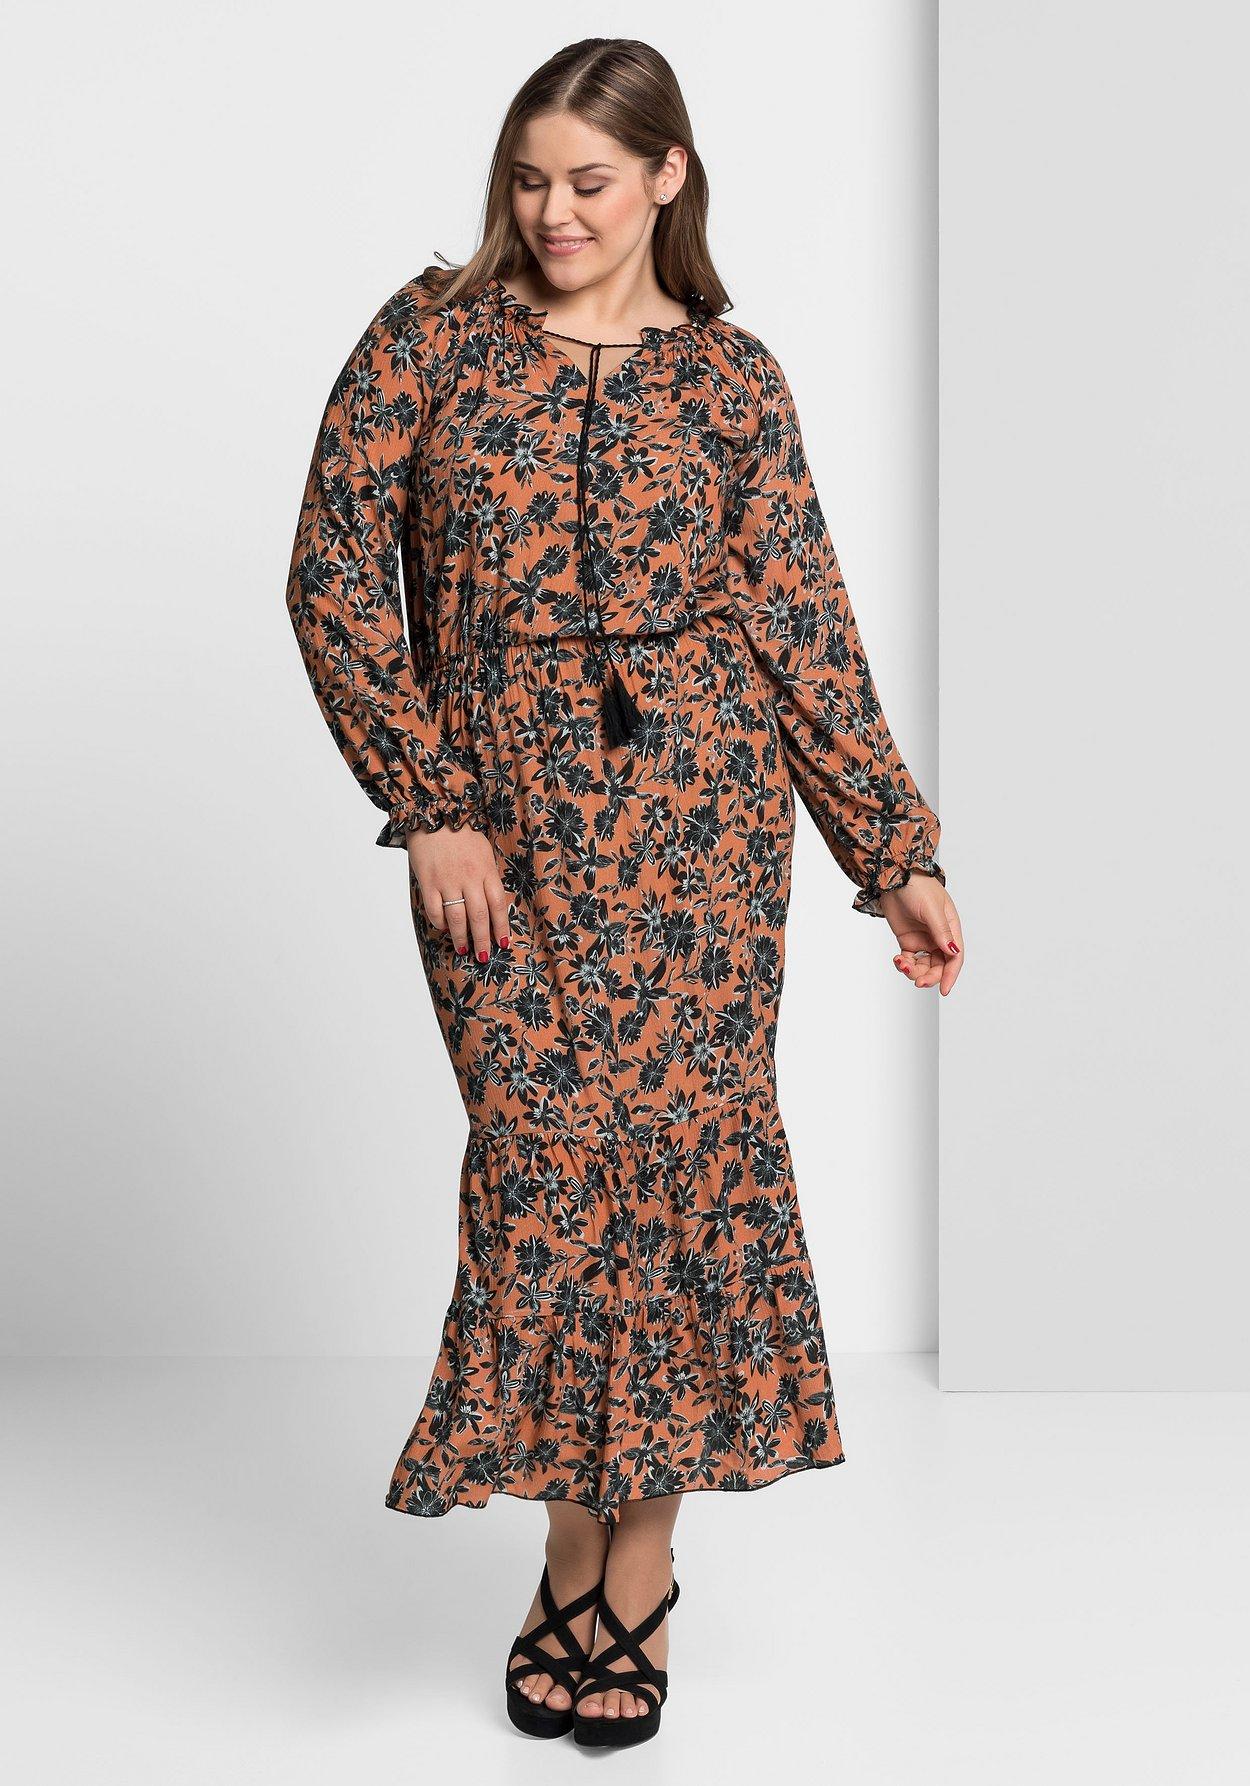 Kleid Im Boho Stil Pfirsichrose Bedruckt Sheego